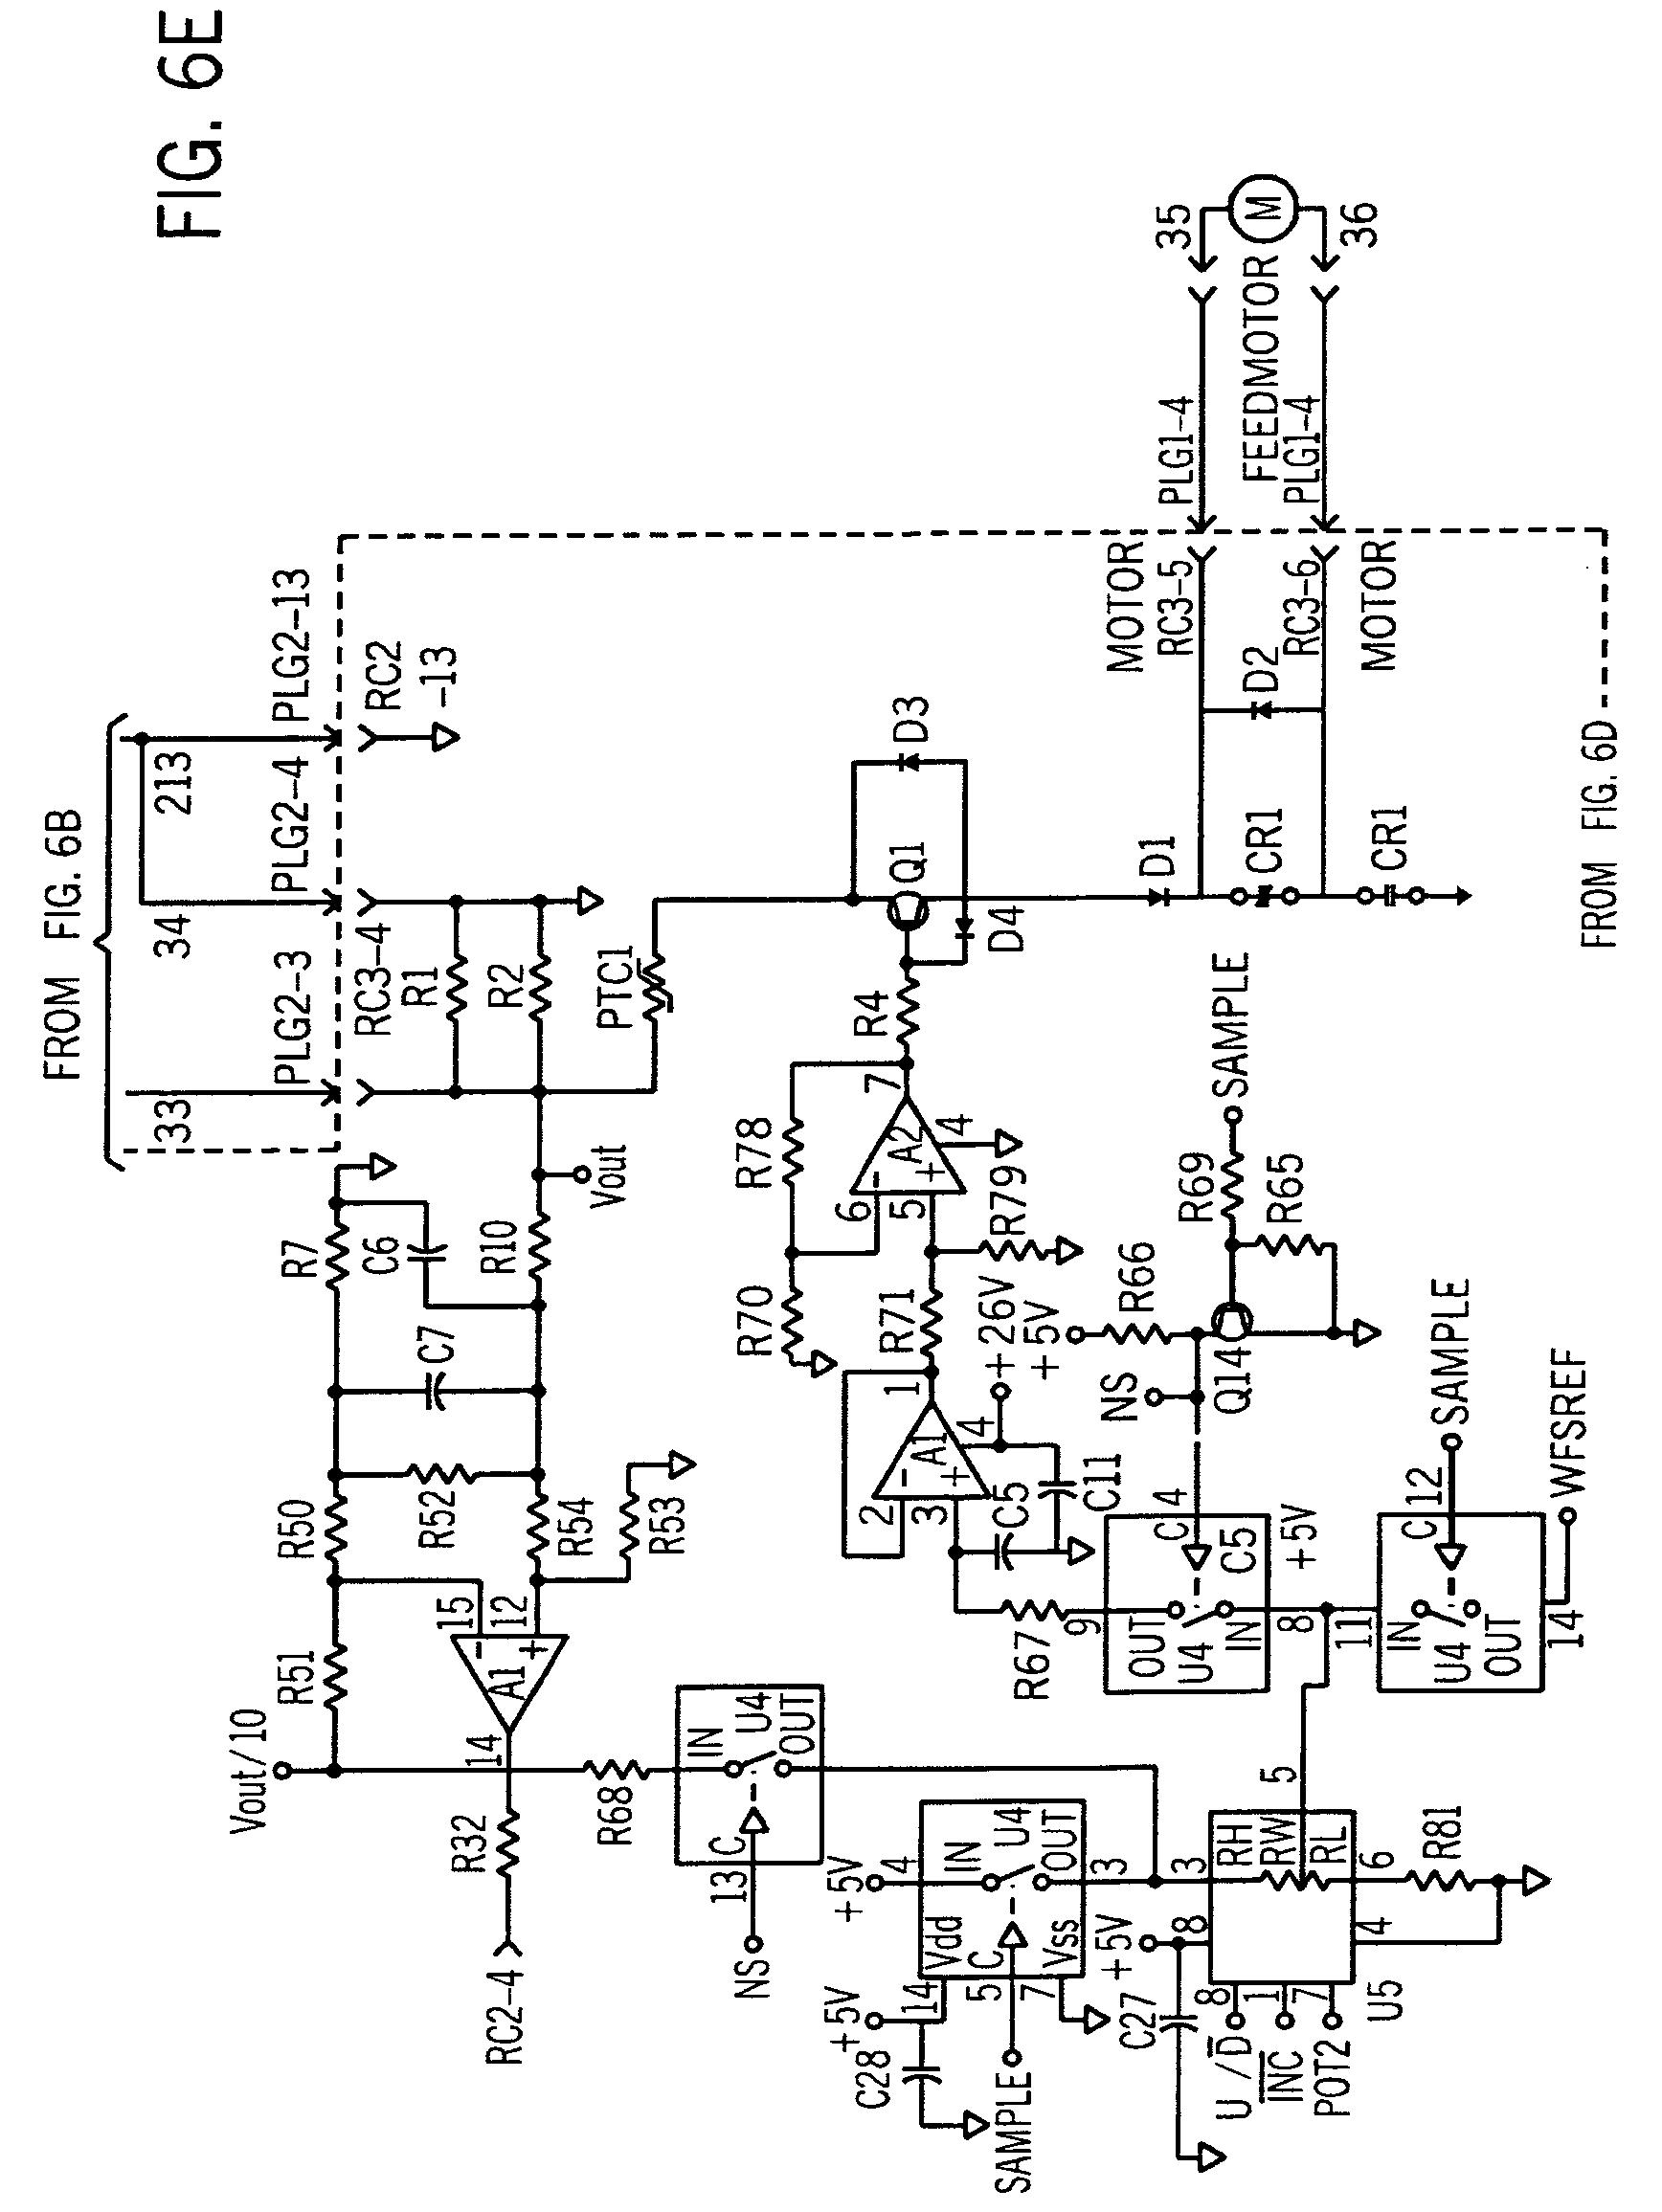 120 hobart welder wiring diagram